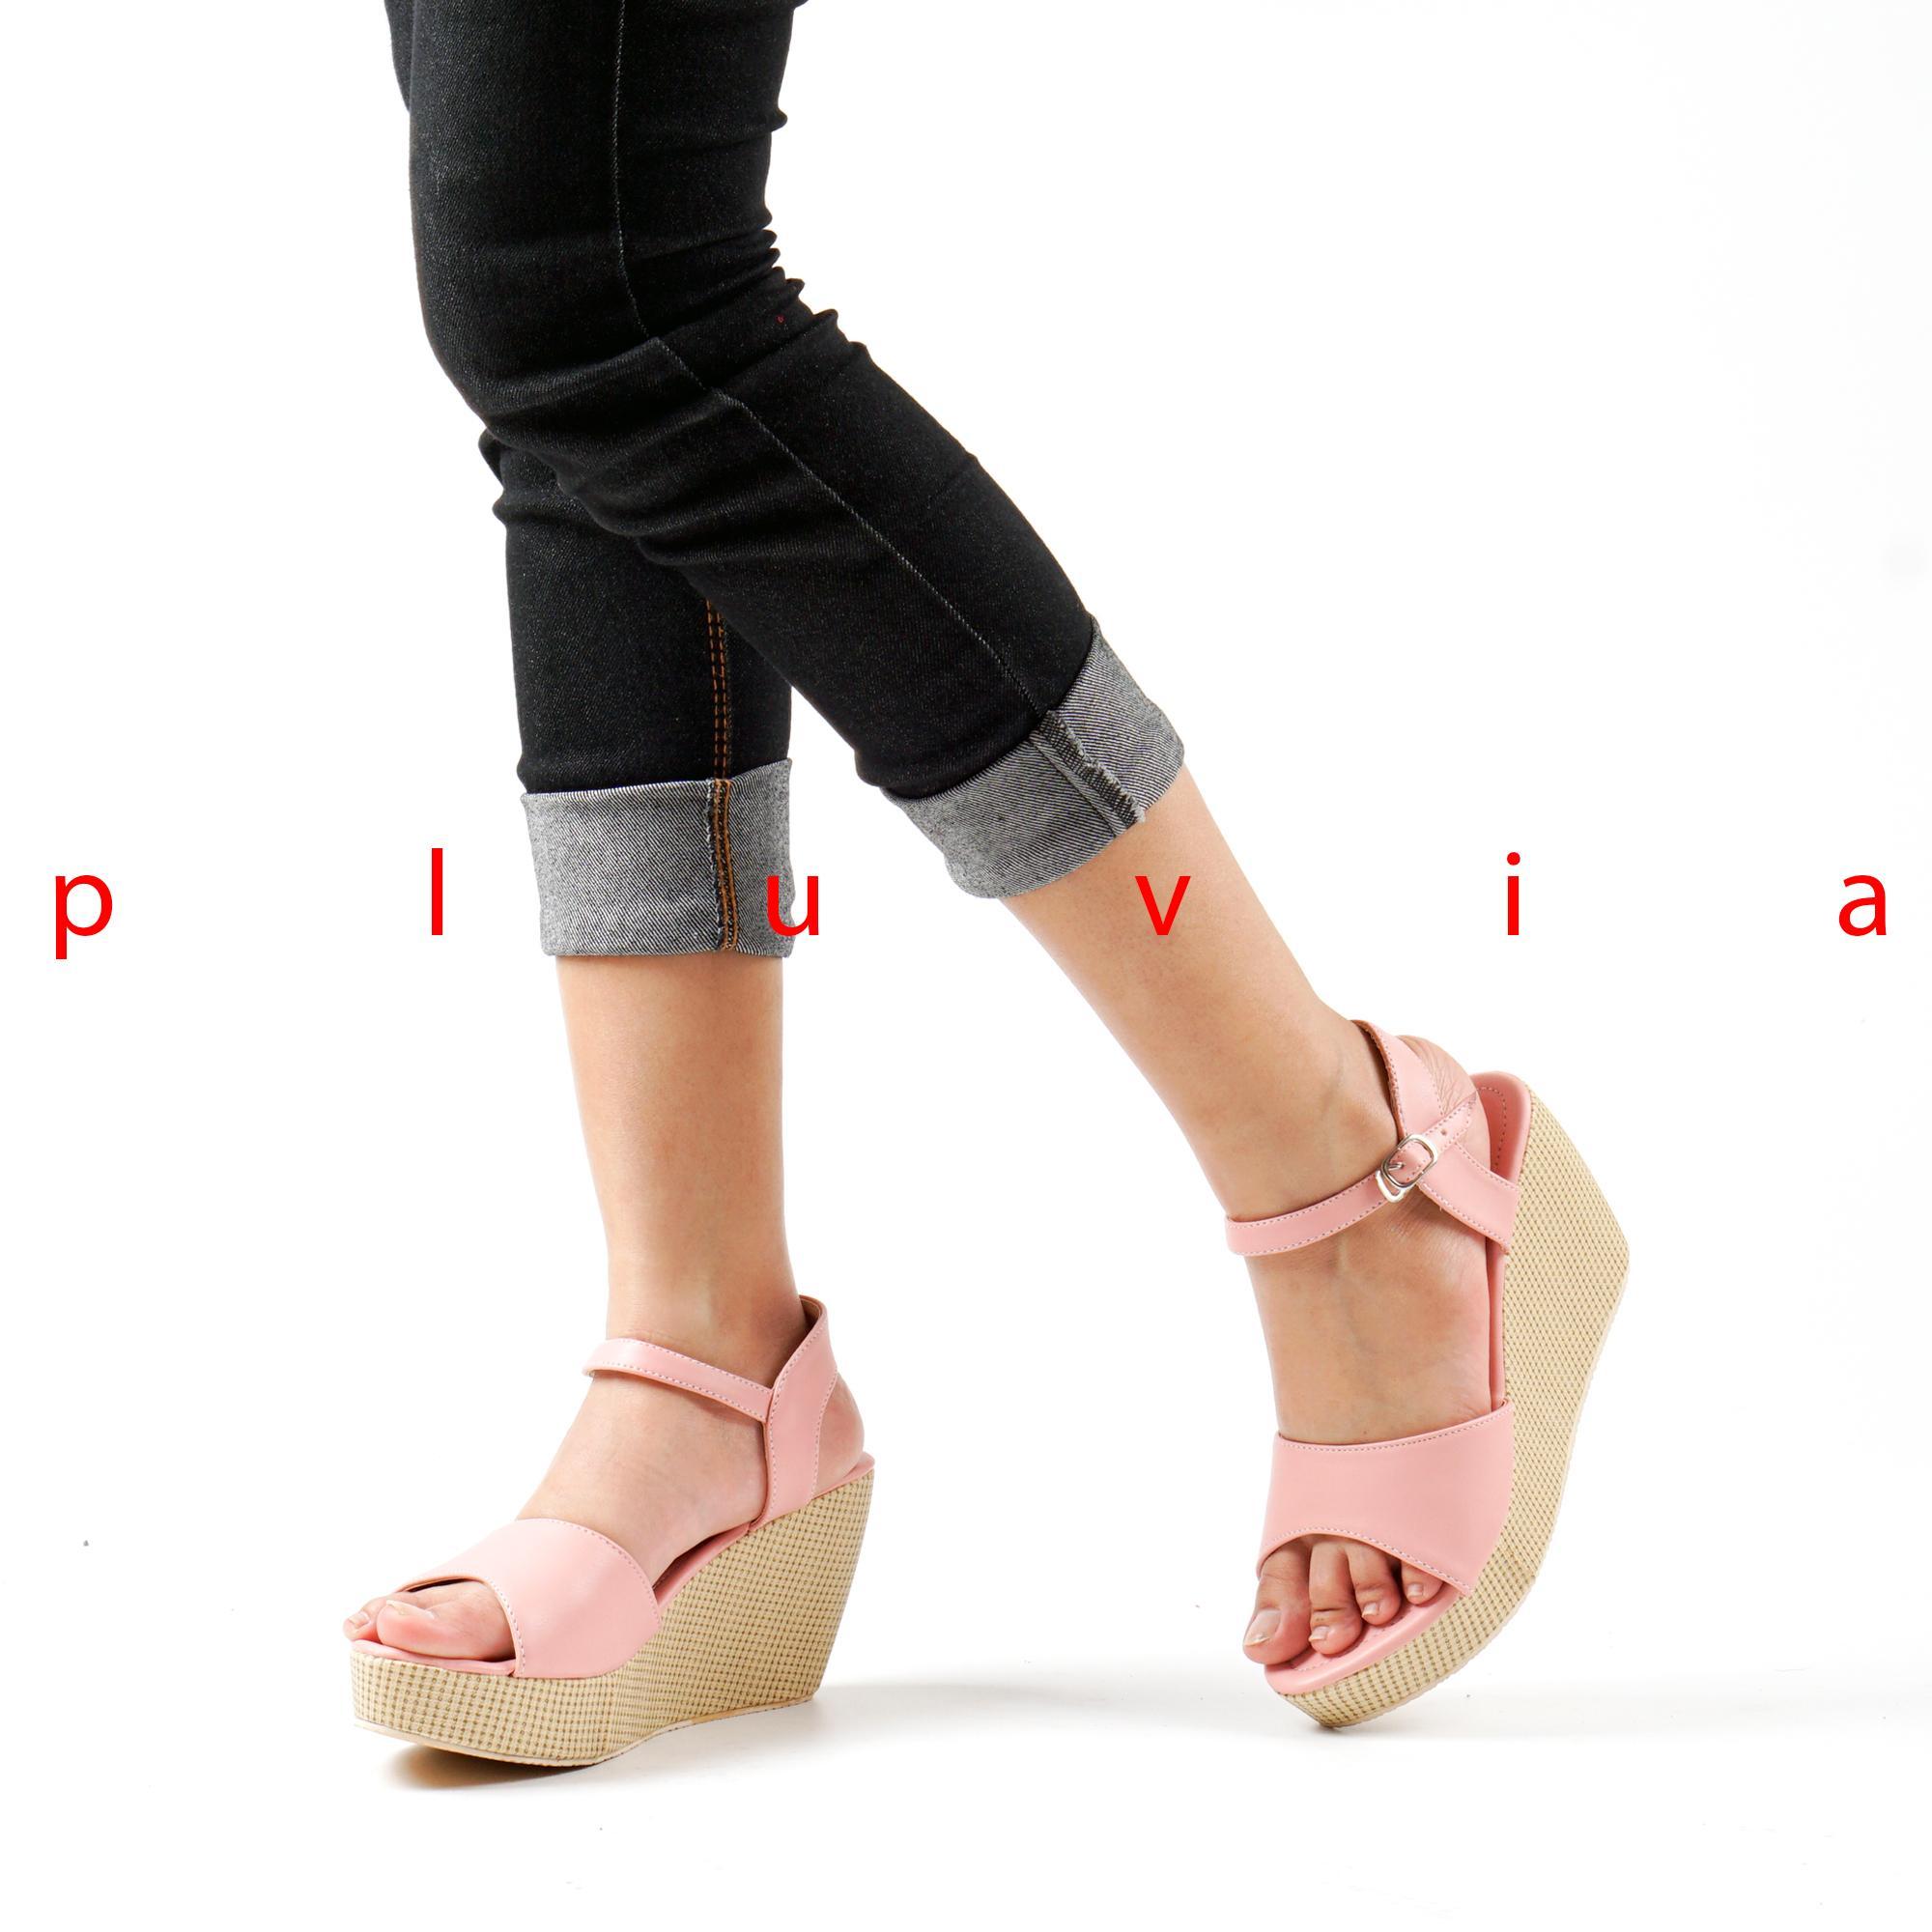 Pluvia - Moya Sepatu Sandal Wedges Wanita Ankle Strap CY07 - Salem